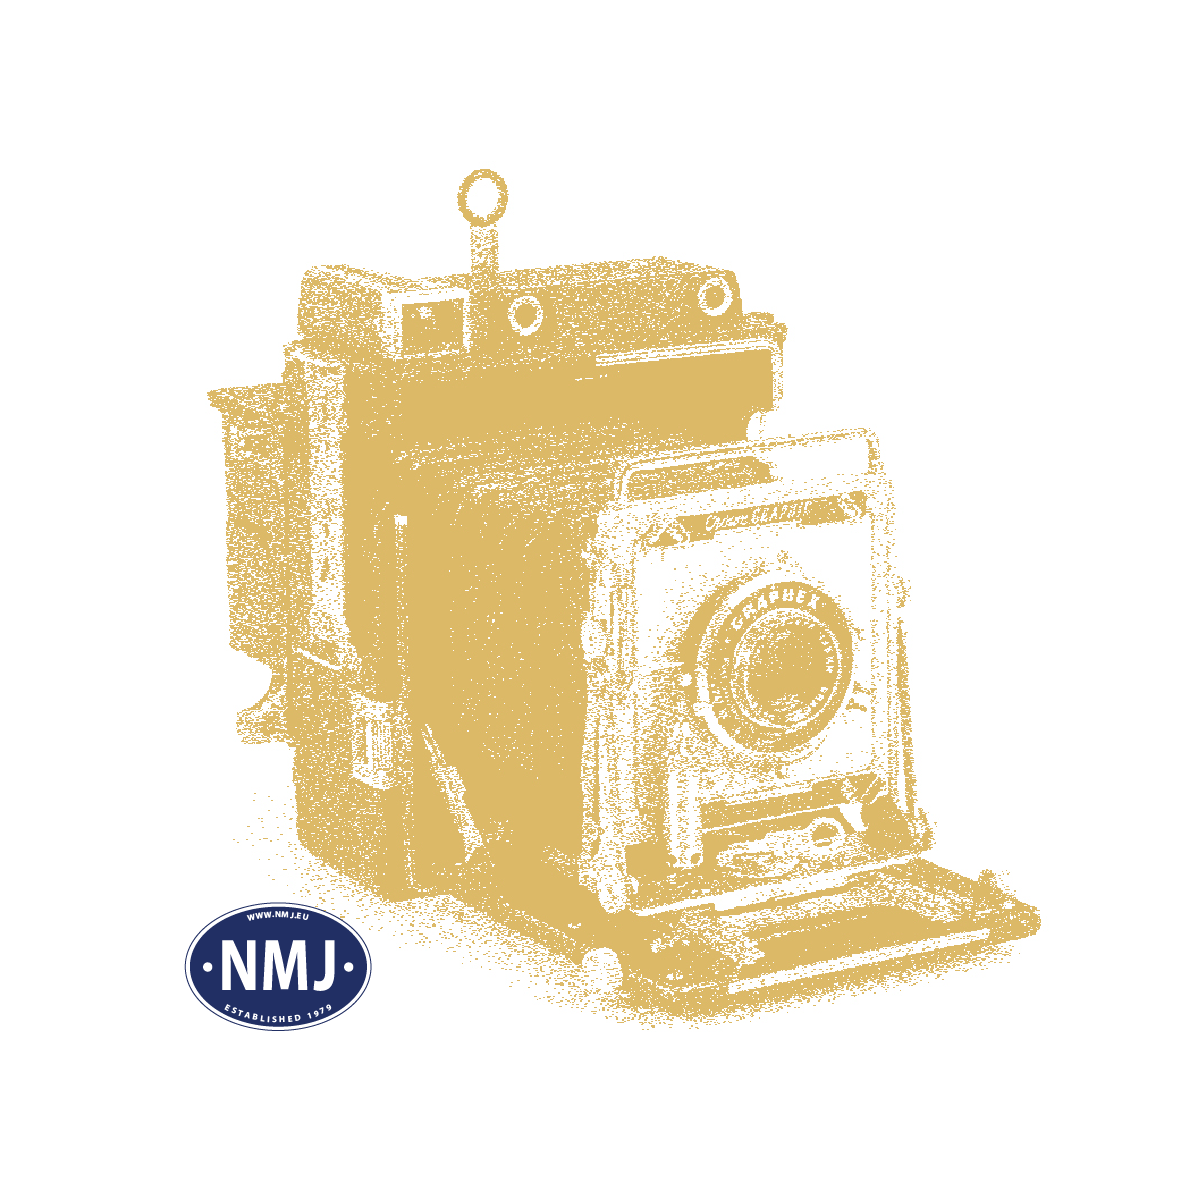 NMJE89900 - *NMJ 40 År* - Baneservice Diesellok MZ 1454 Balder, DCC m/ Lyd